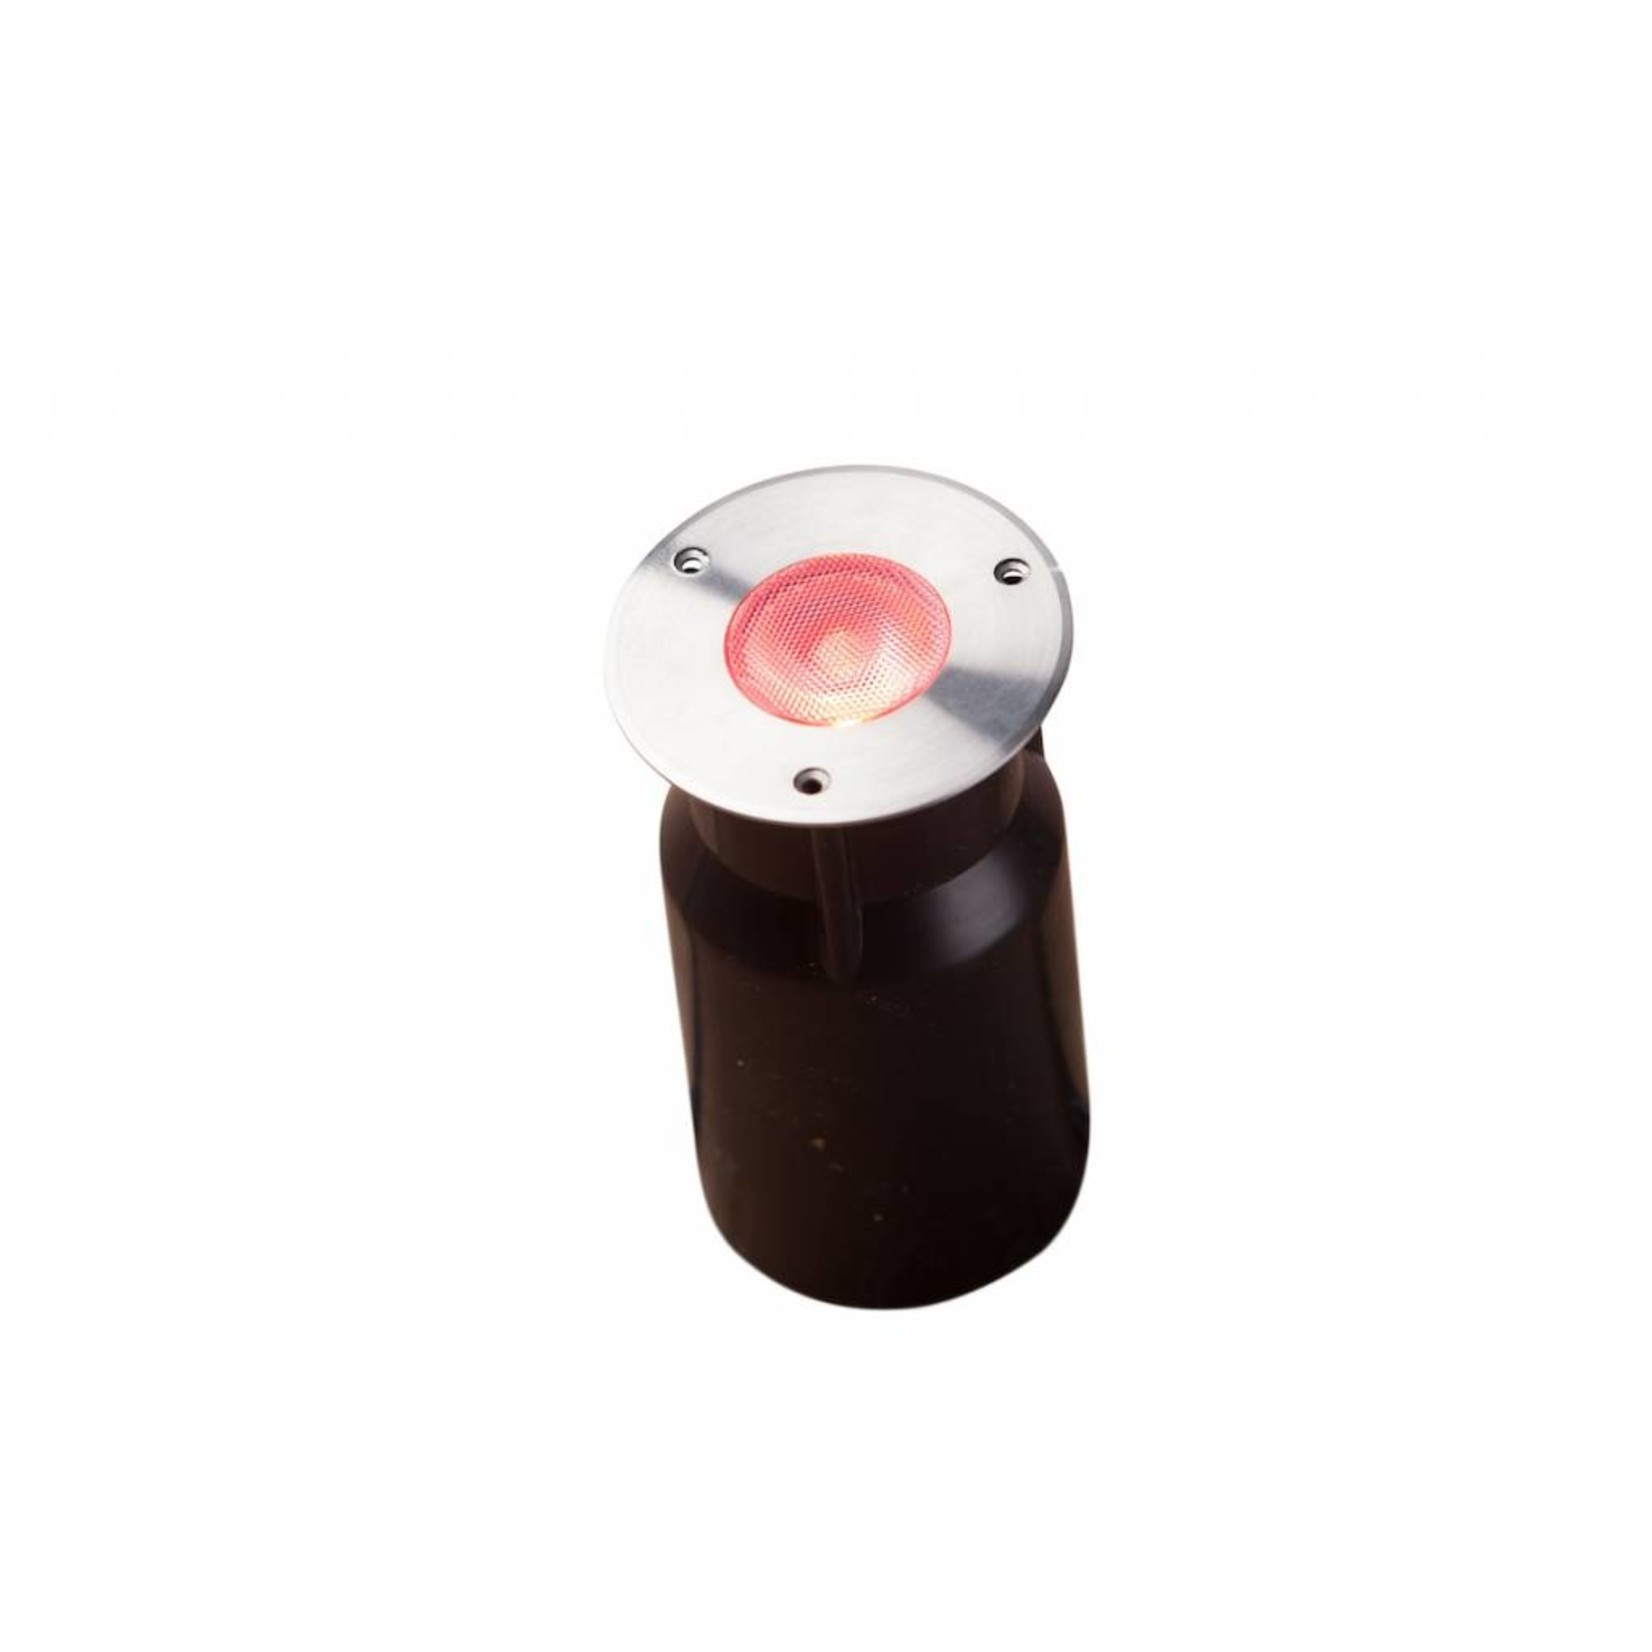 Heissner Smart Light vlonderverlichting 3W RGB RVS